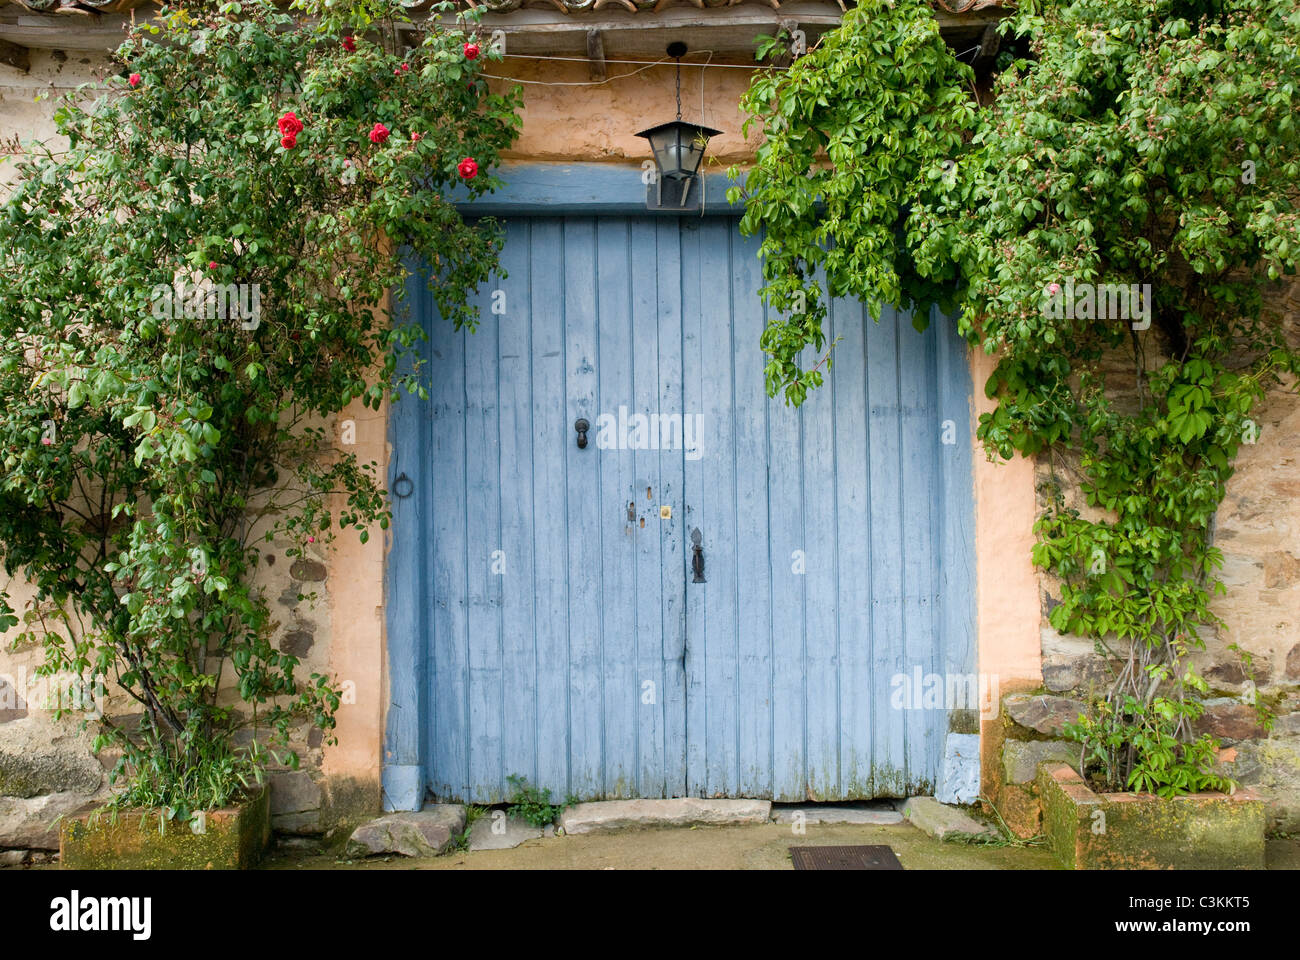 Traditional rustic doorway along the pilgrimage route, Camino de Santiago, Northern Spain - Stock Image